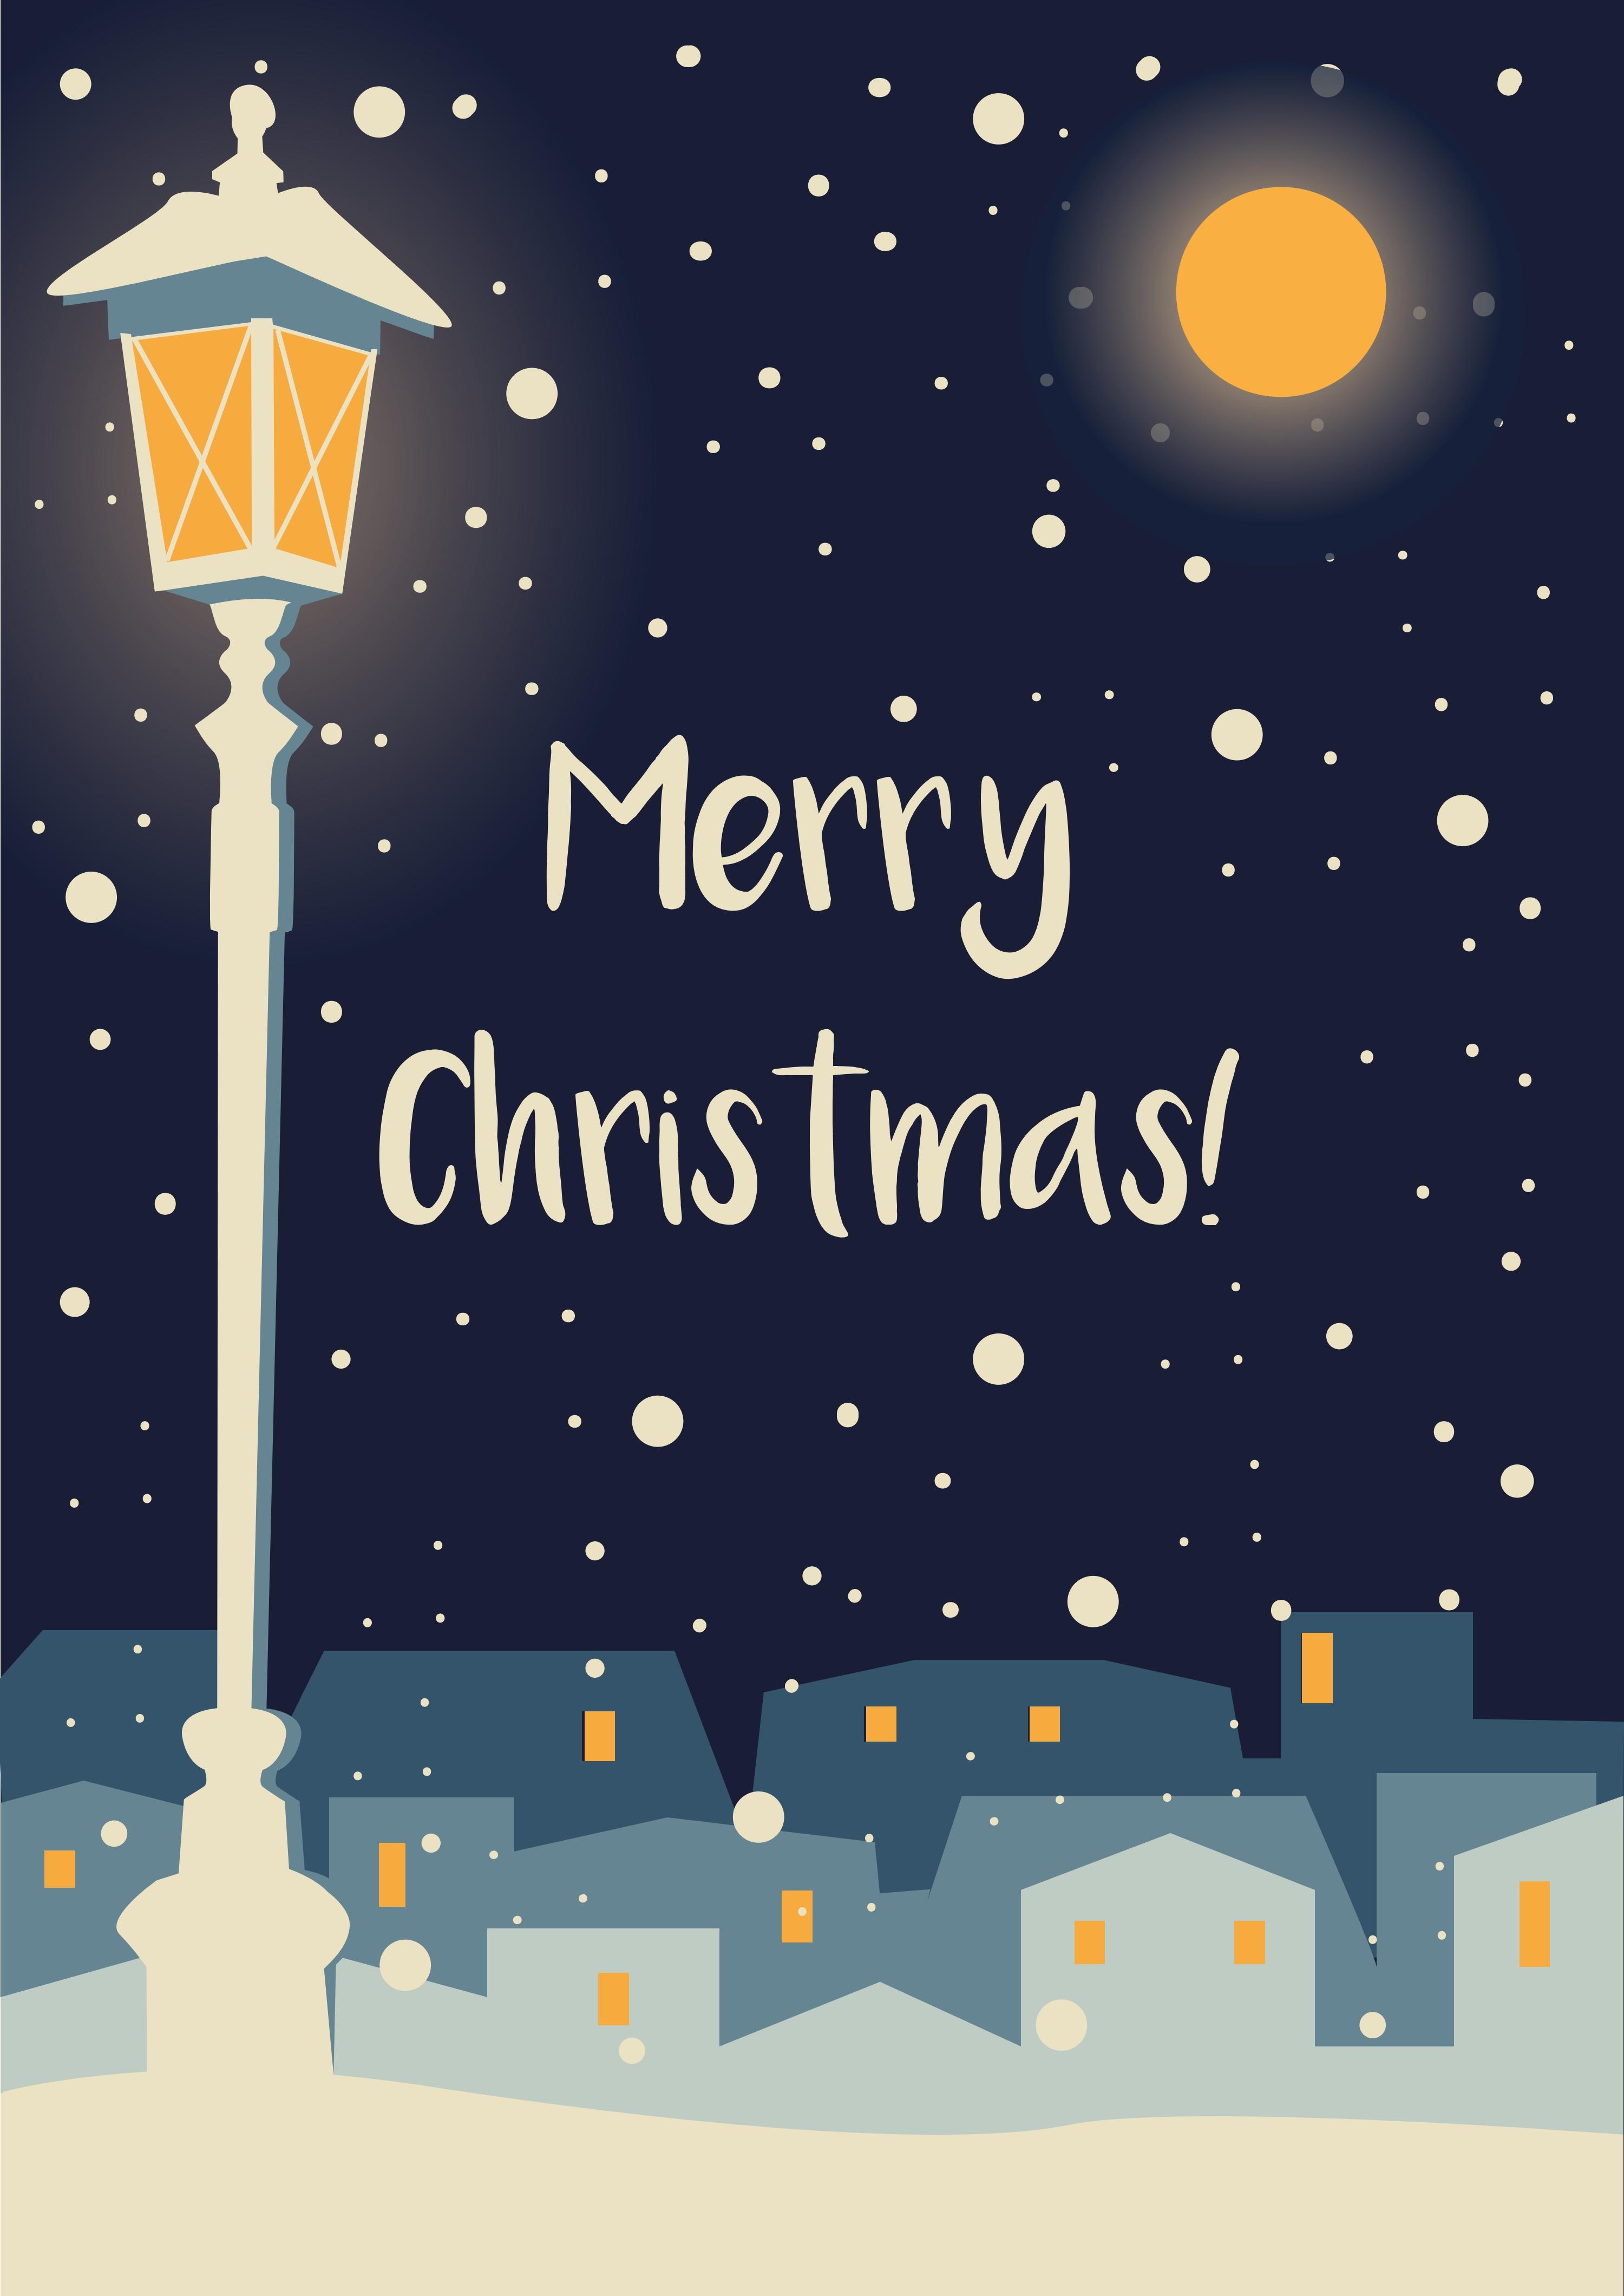 Merry Christmas from the Blueridge Community Association